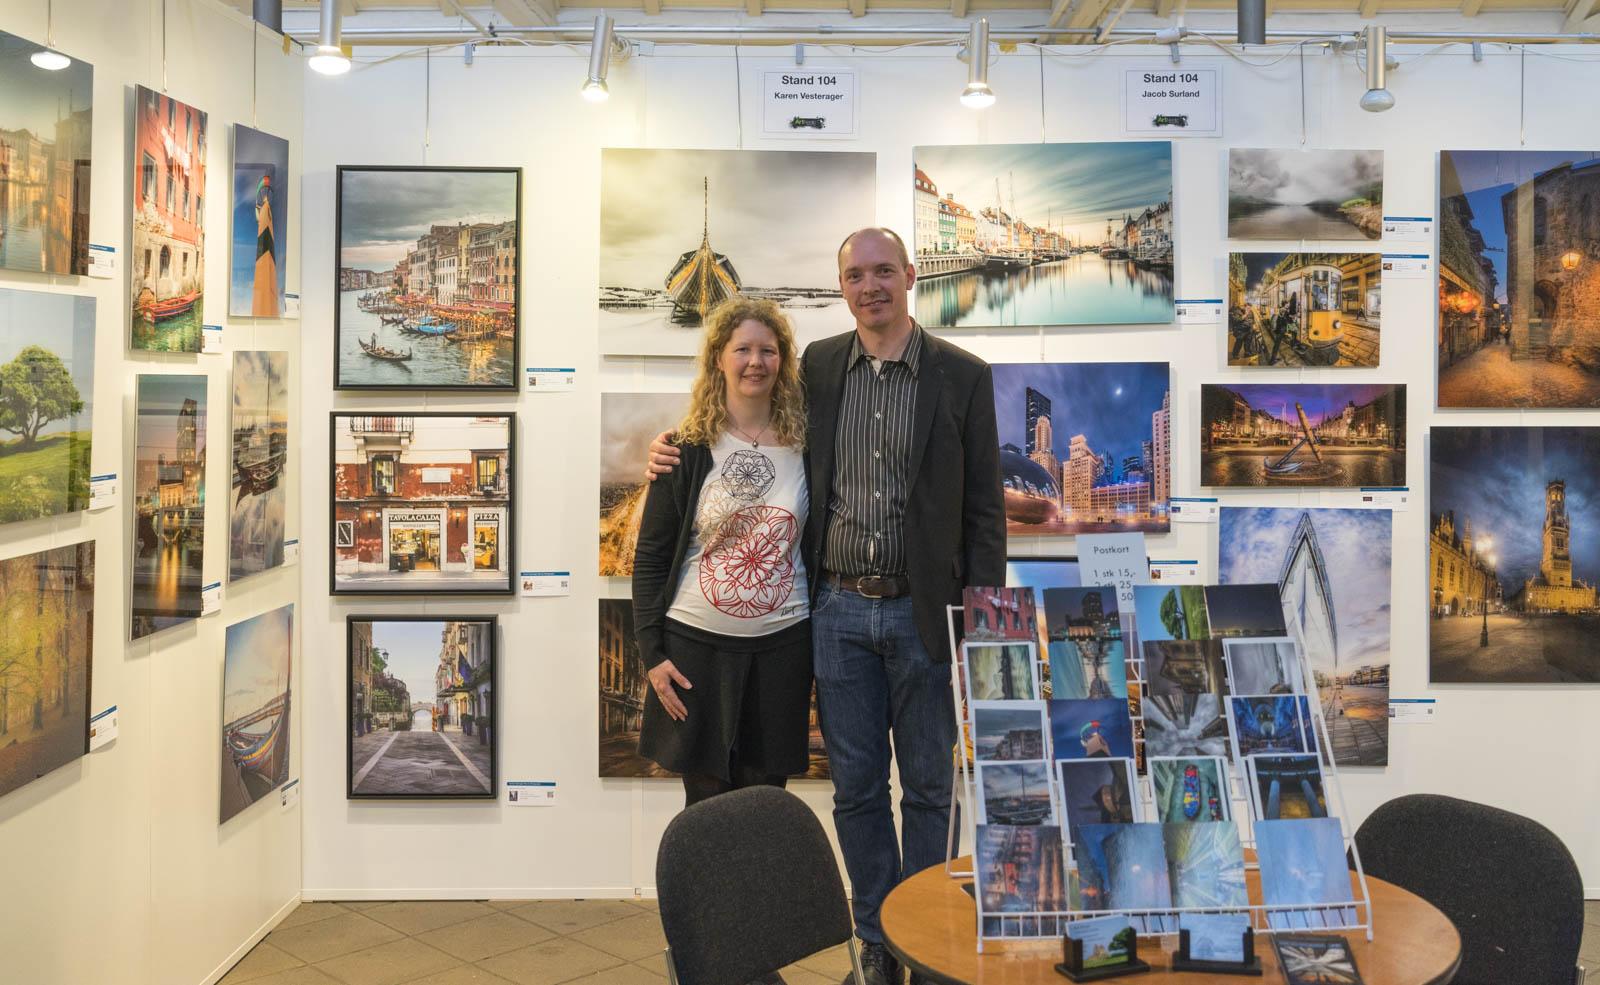 Jacob Surland and Karen Vesterager at Art Nordic 2016.